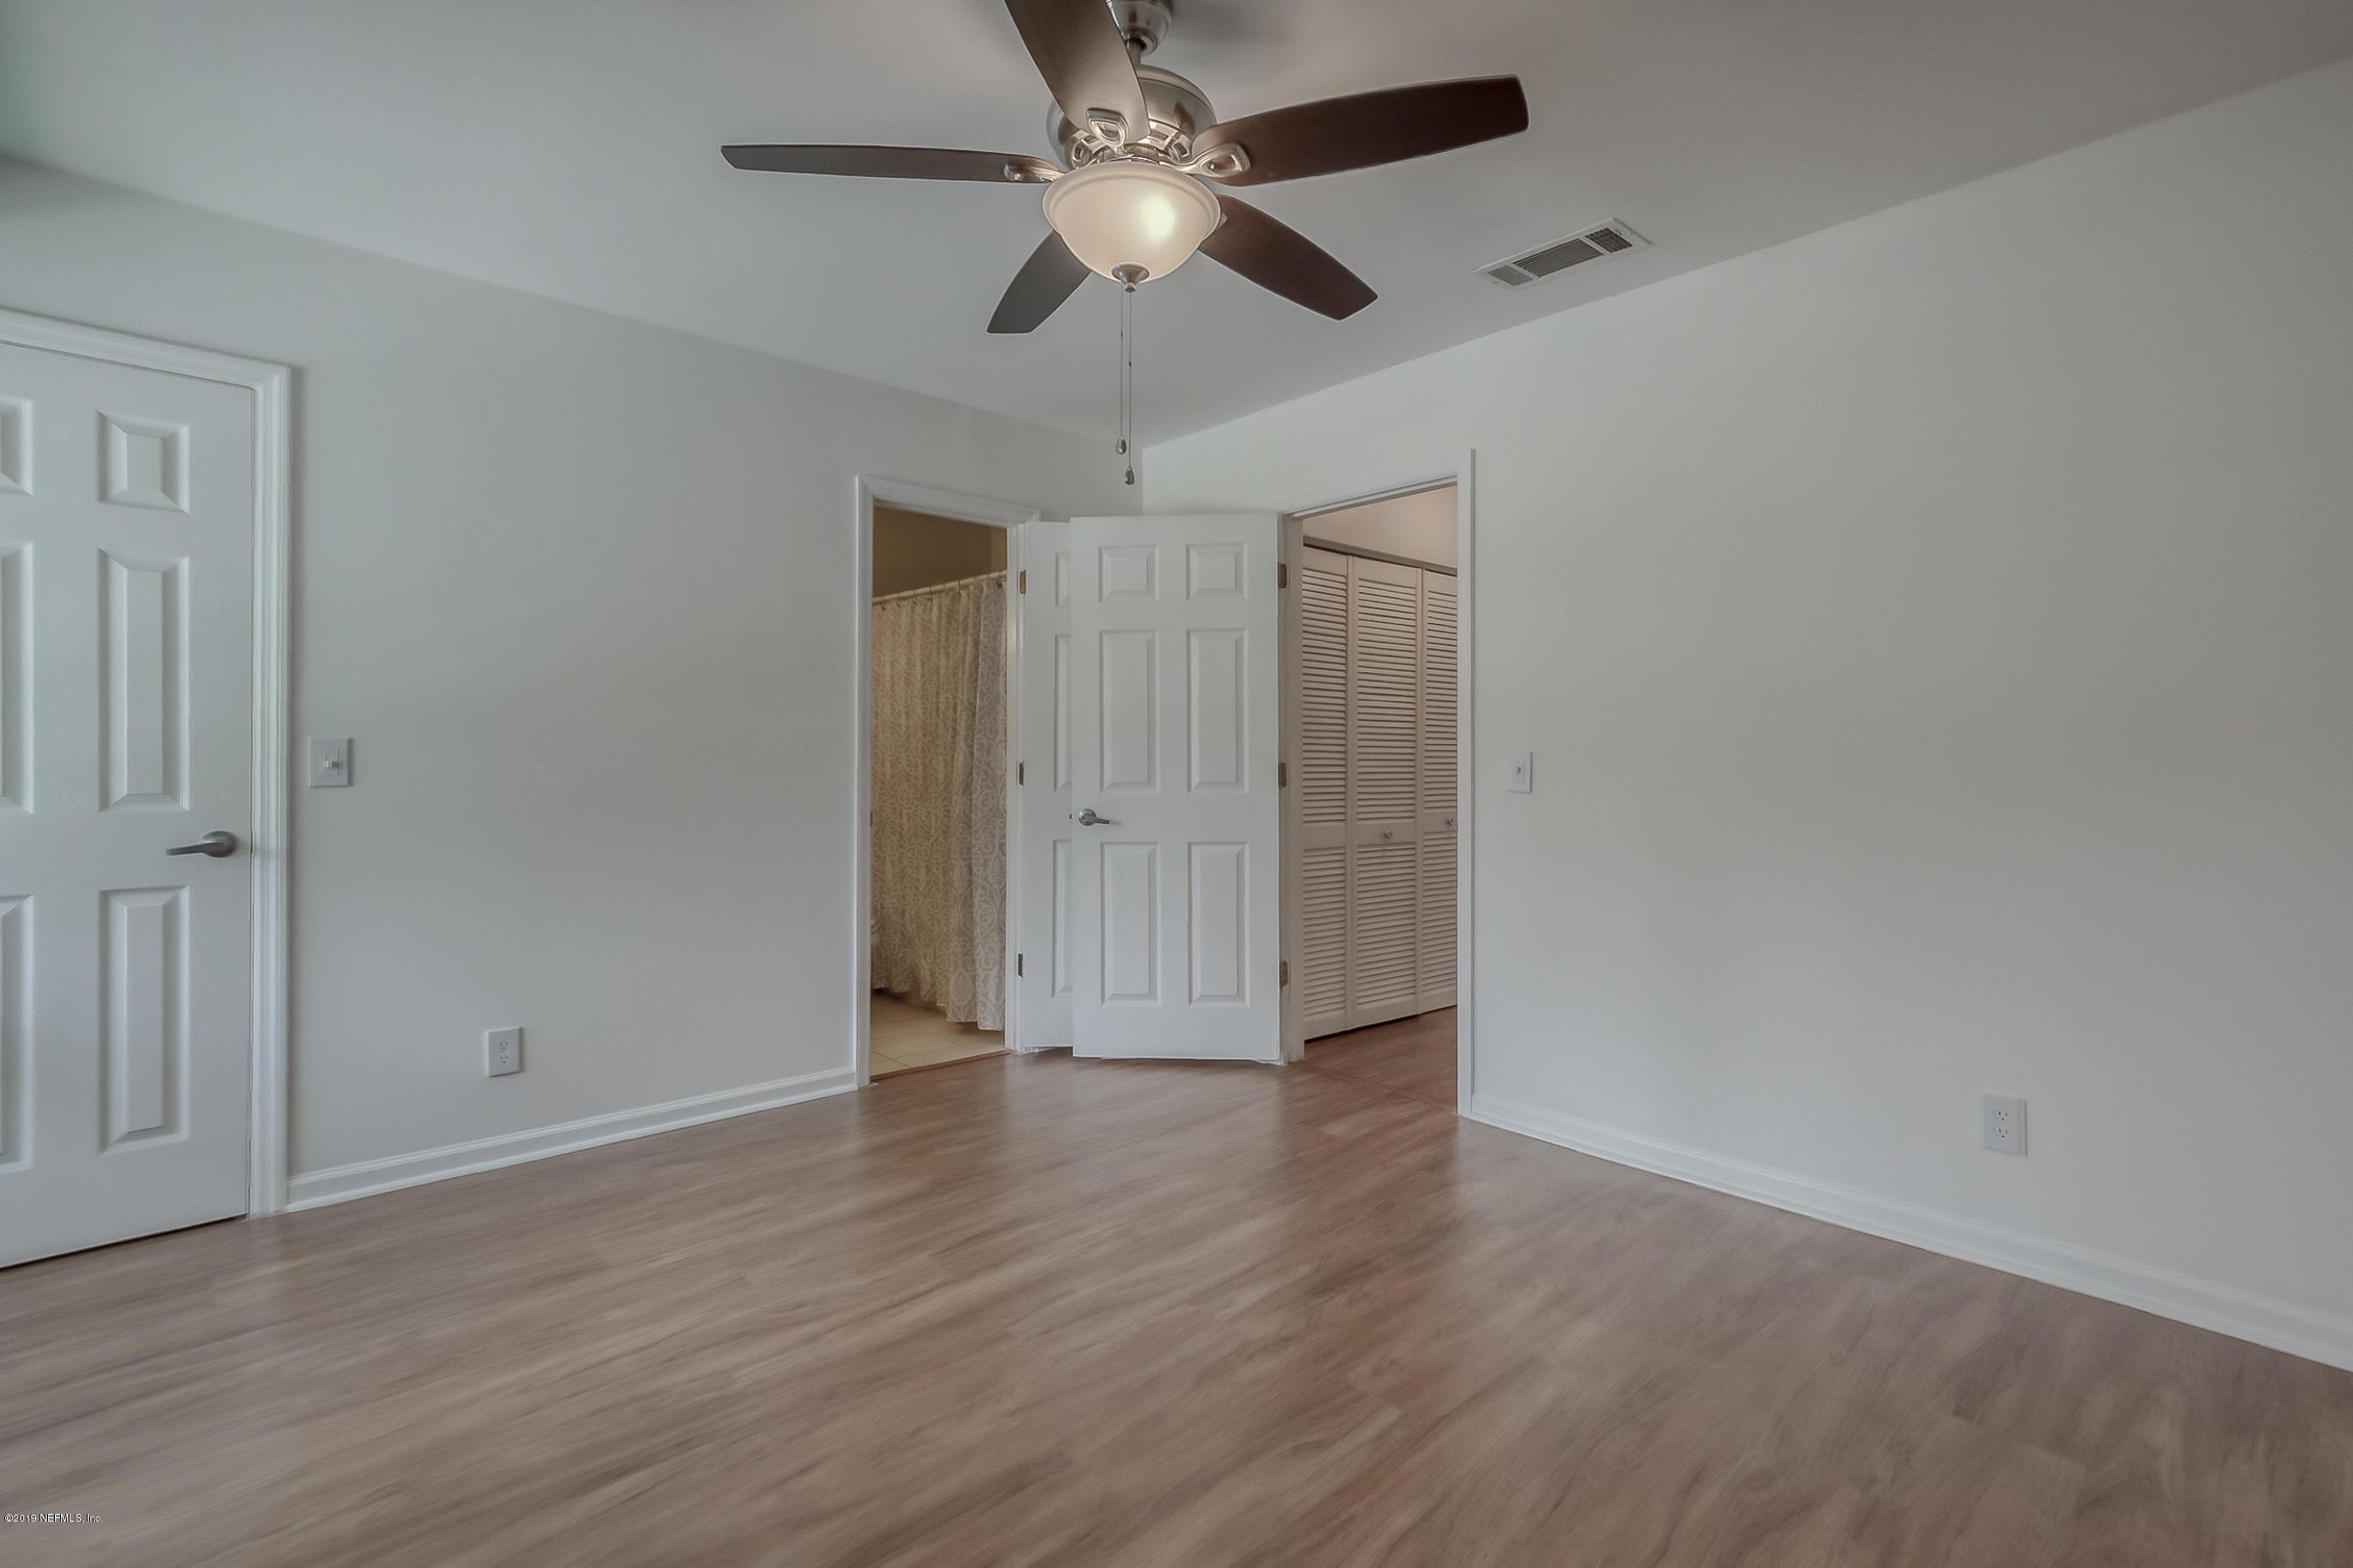 8880 OLD KINGS- JACKSONVILLE- FLORIDA 32257, 2 Bedrooms Bedrooms, ,2 BathroomsBathrooms,Condo,For sale,OLD KINGS,1003206